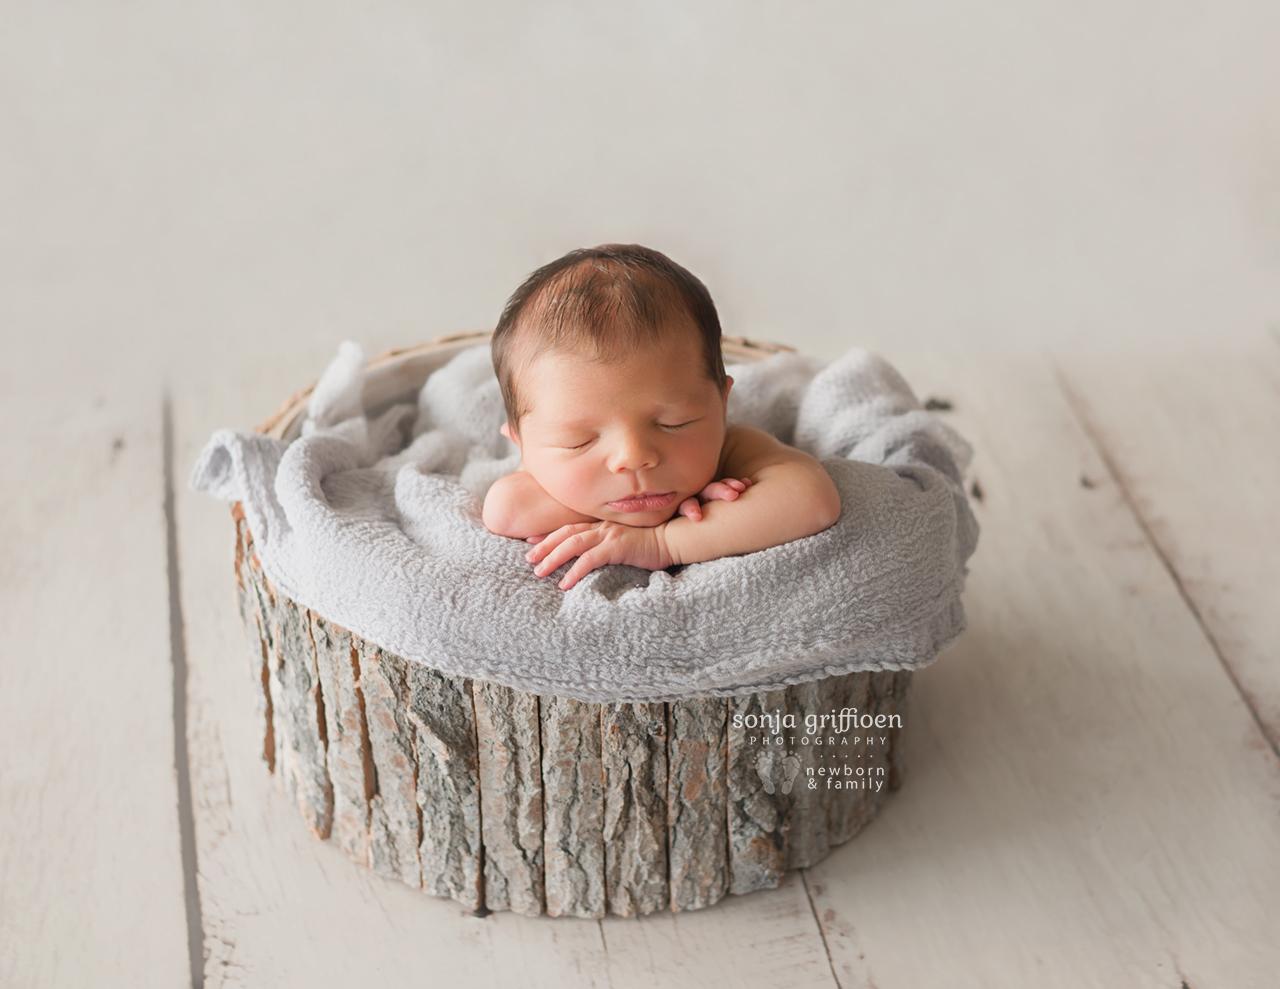 Caleb-Newborn-Brisbane-Newborn-Photographer-Sonja-Griffioen-19.jpg